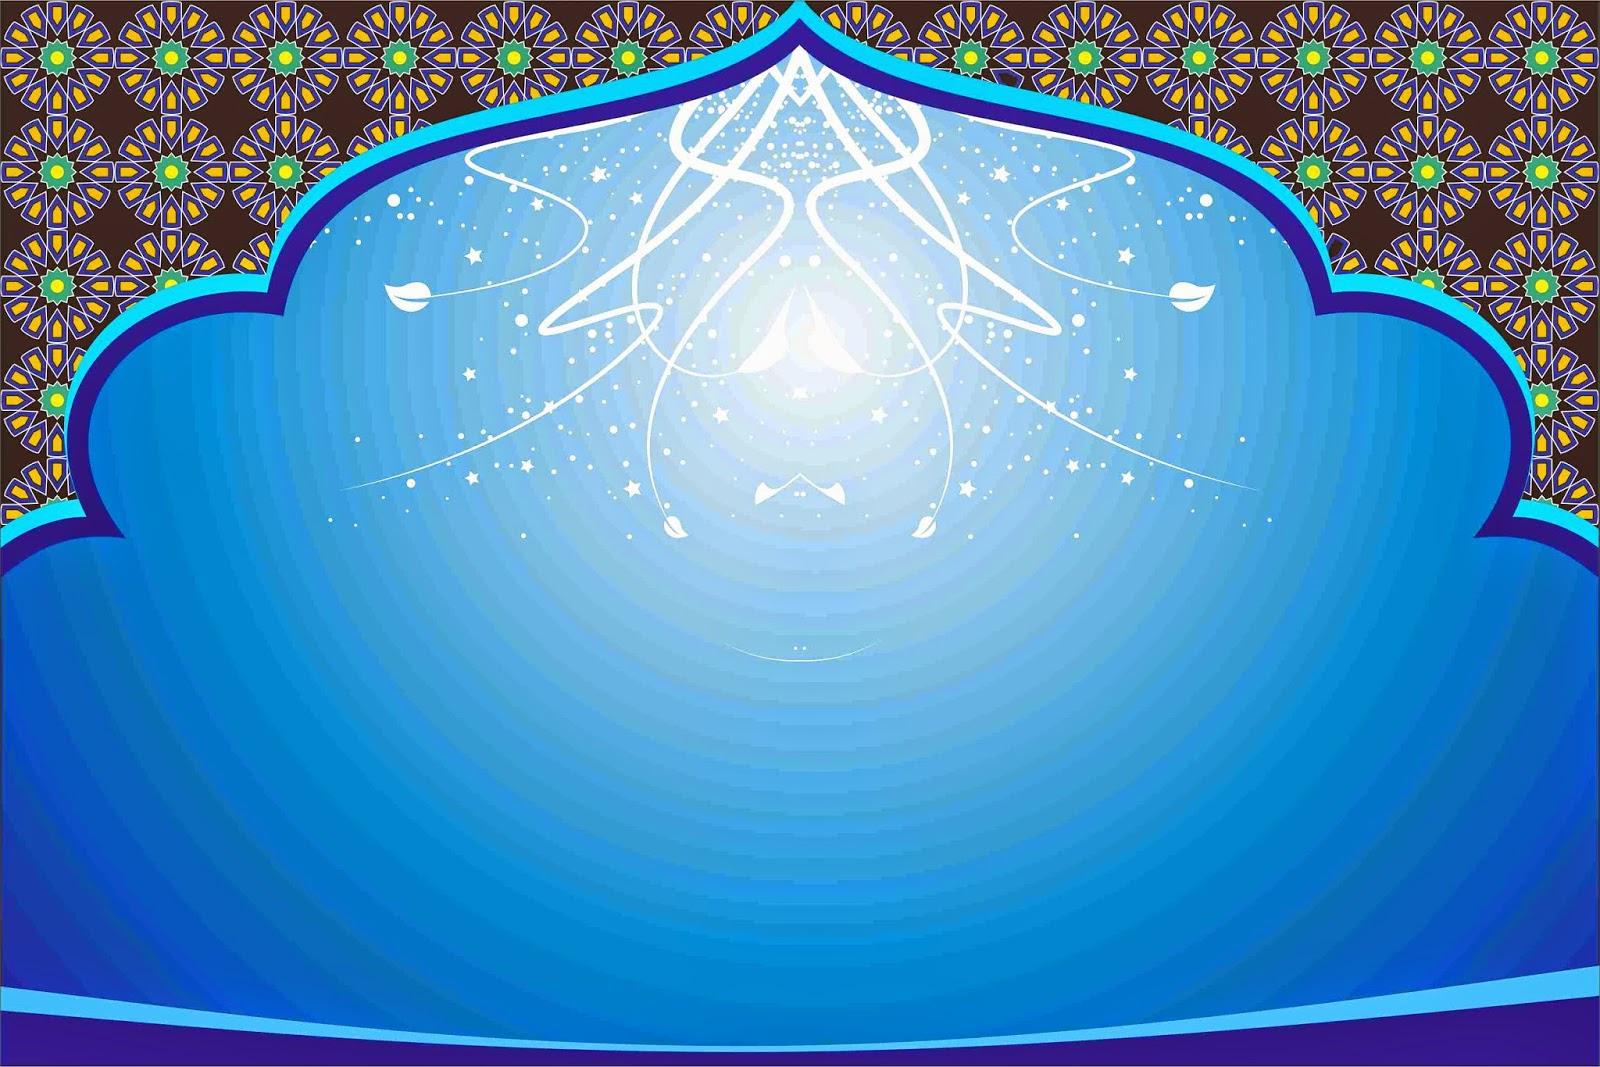 Corel Gunkid Download Desain Background Islami 2 File Cdr